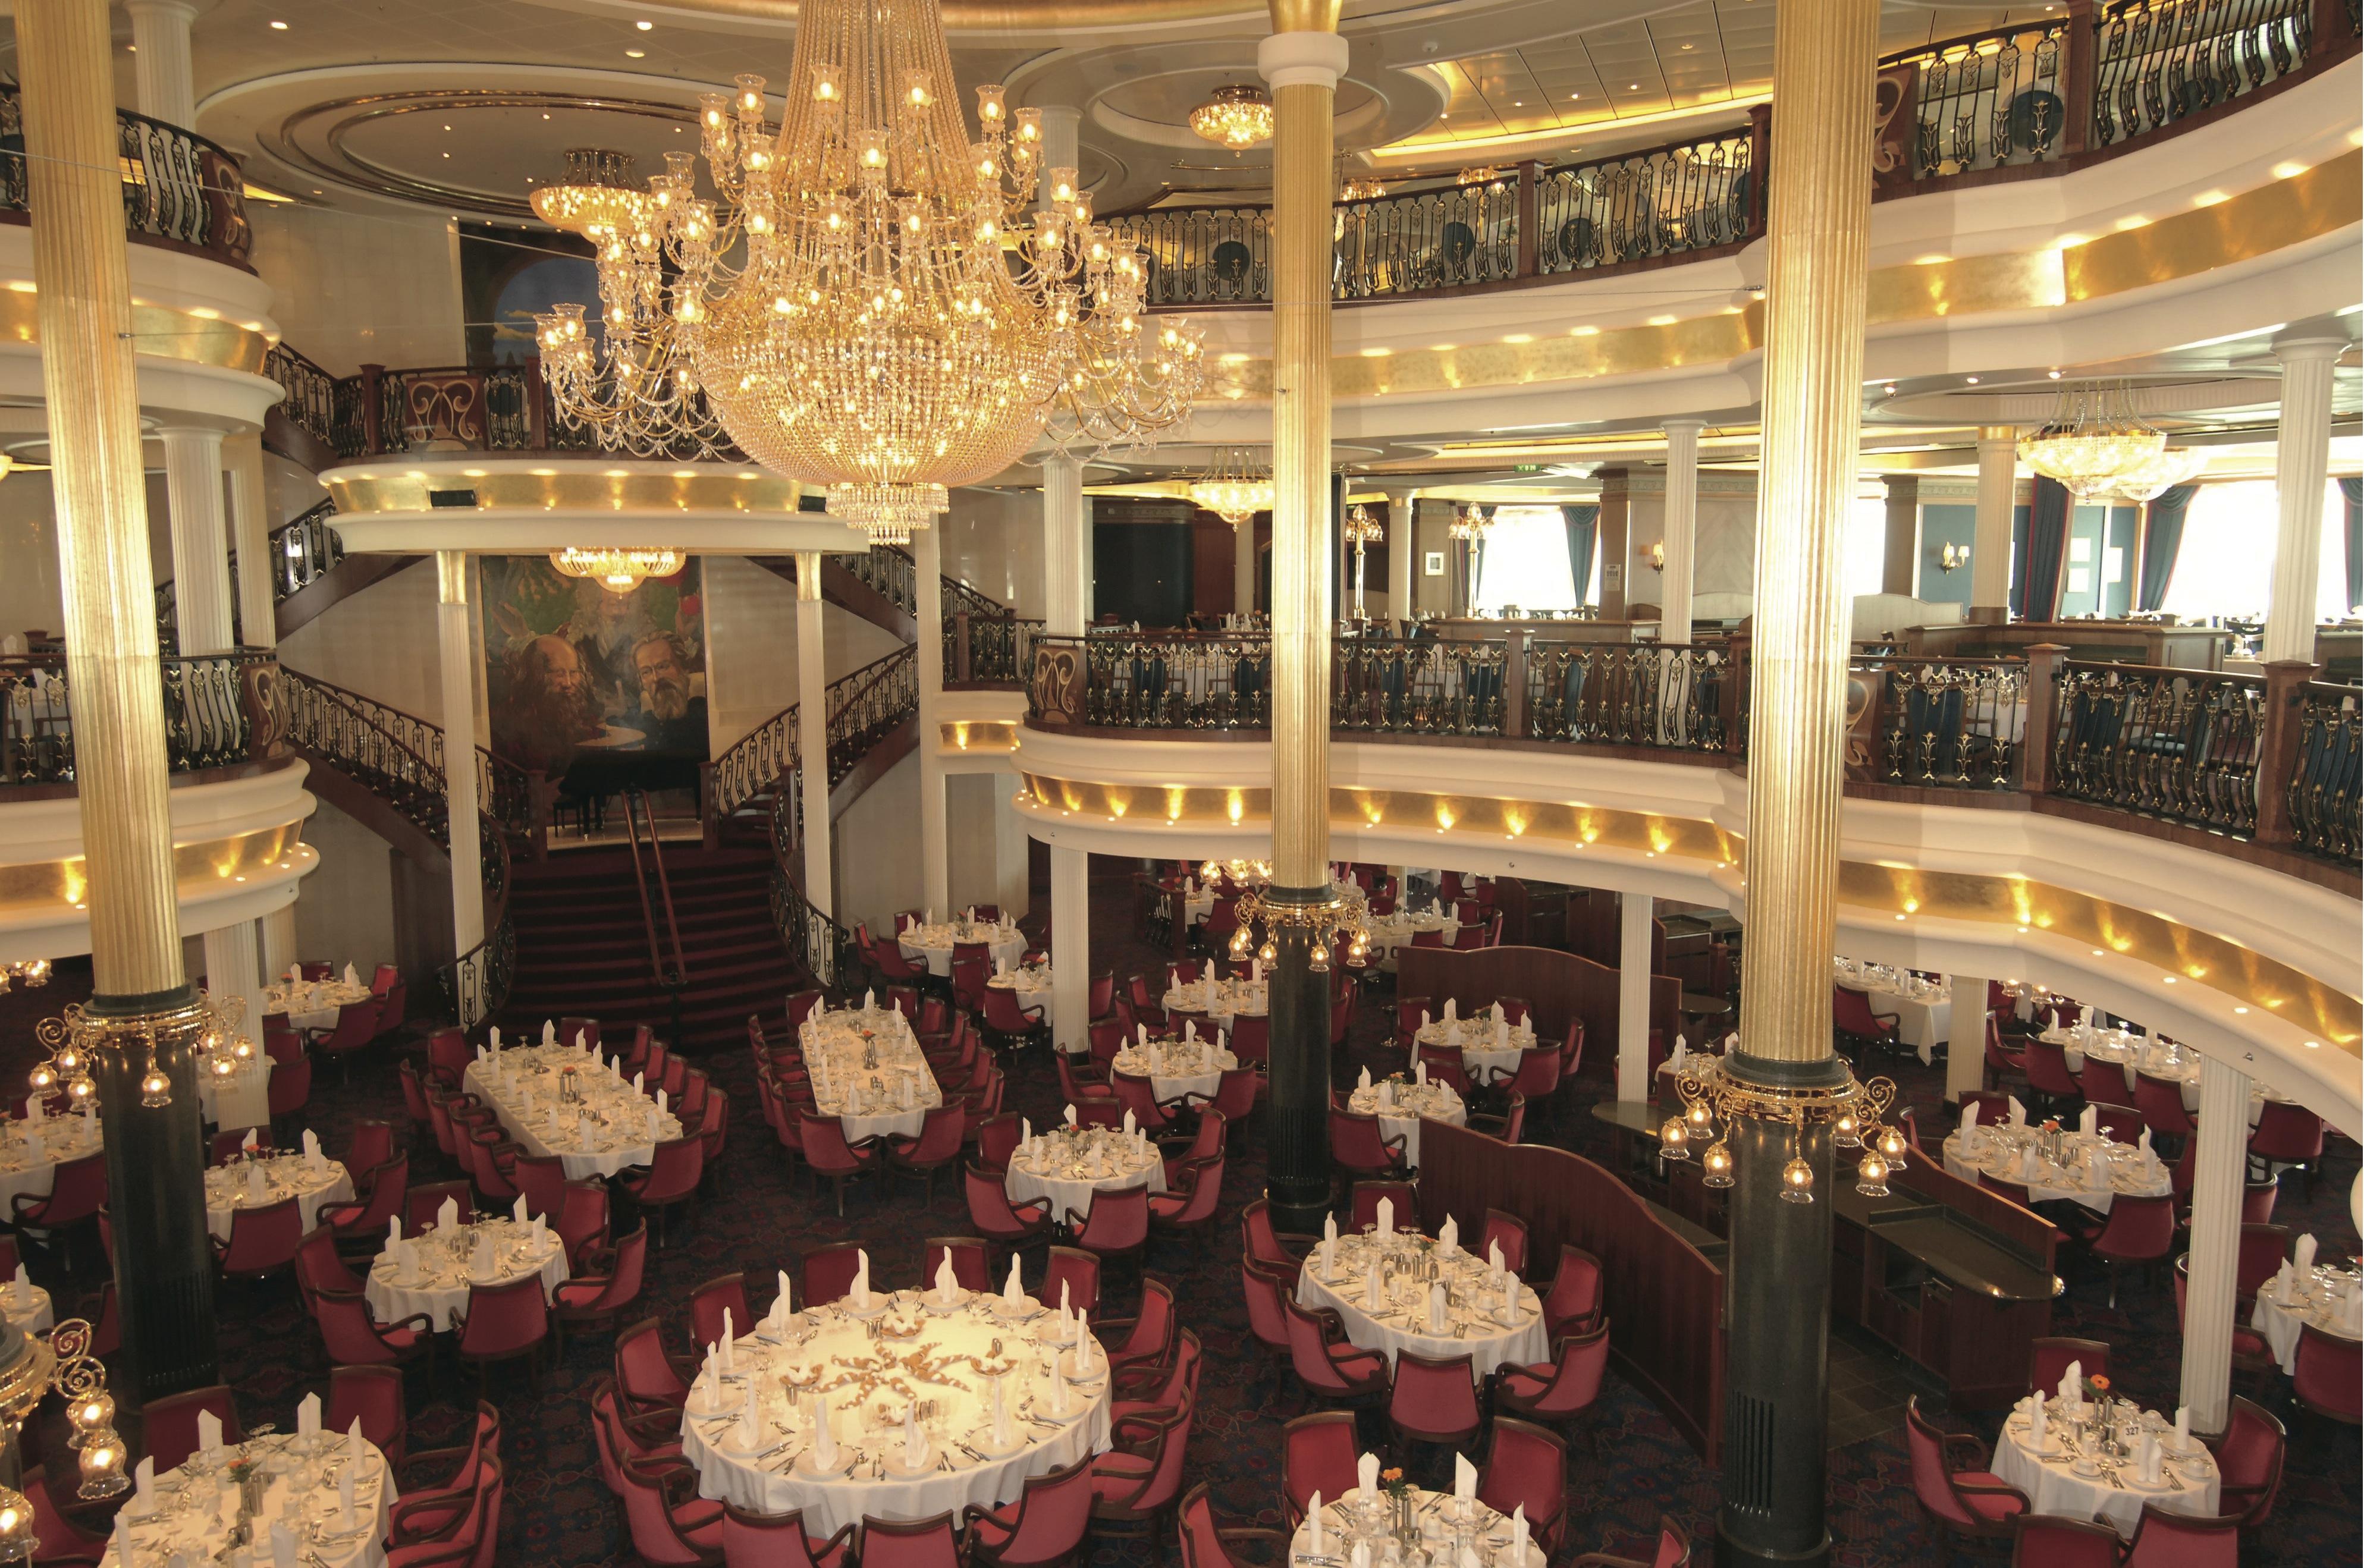 Royal Caribbean International Freedom of the Seas Interior Main Dining Room 2.jpeg